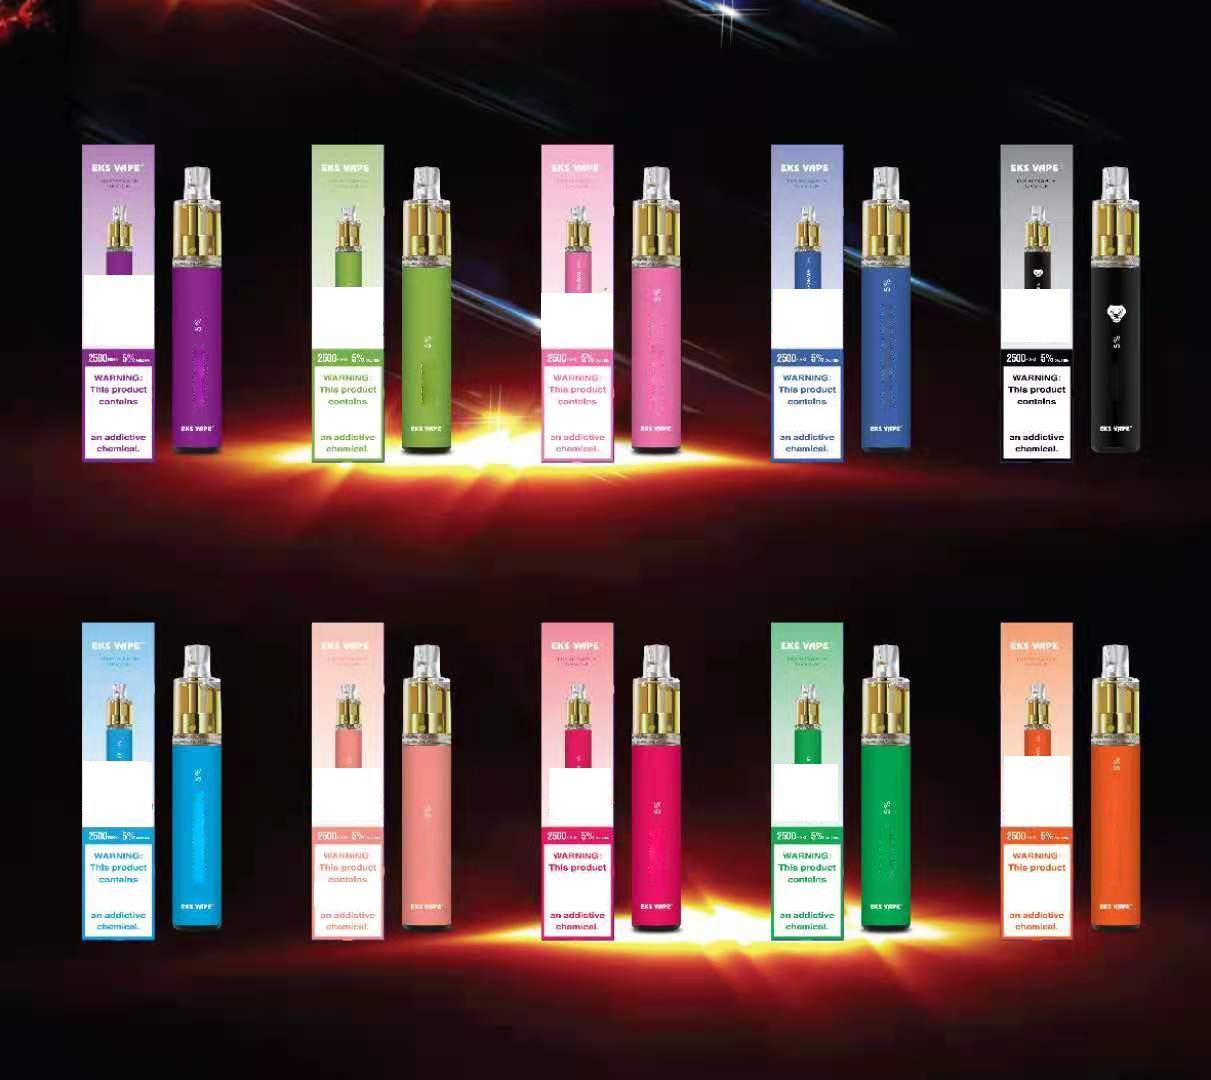 Original descartável Vape Eks 2500 Puffs E Cigarro Vapor Dispositivo Recarregável Prefilado Vaporizador Portátil Vs Vs Puff Air Bar Max Lux Bang XXL